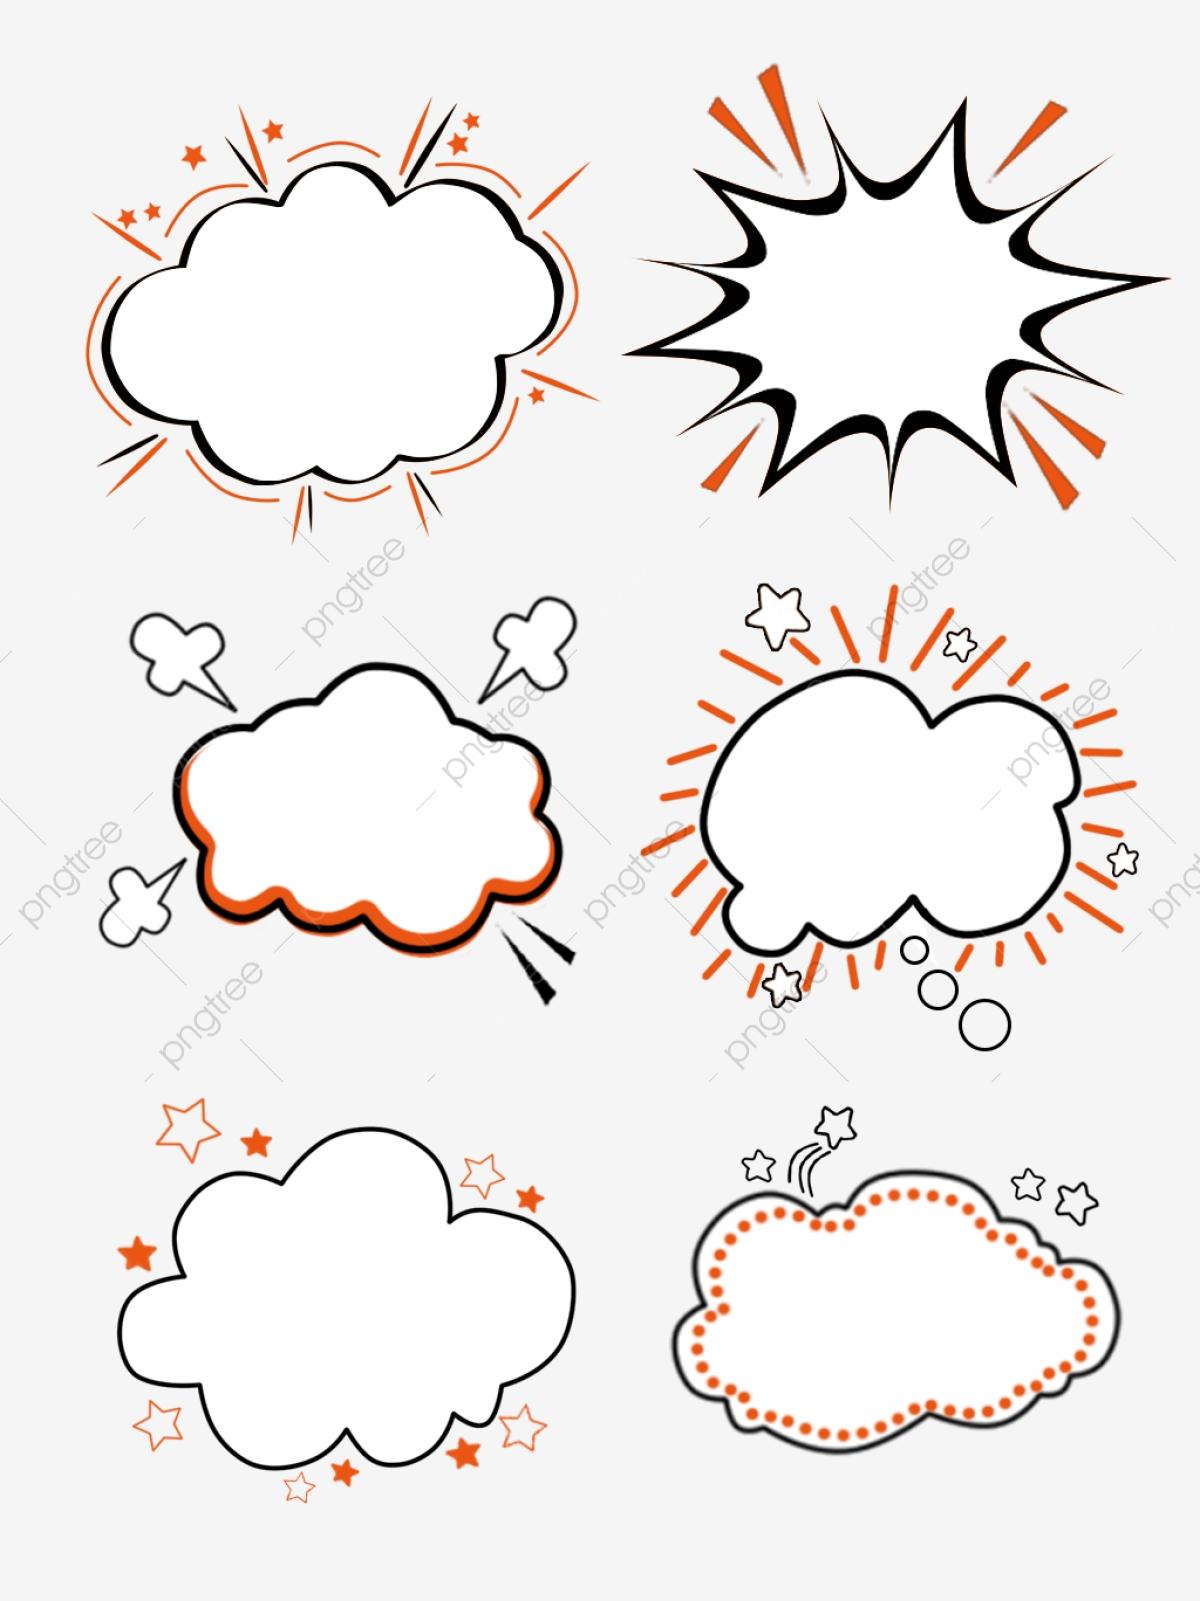 Hand drawn minimalistic orange. Clipart explosion simple cartoon